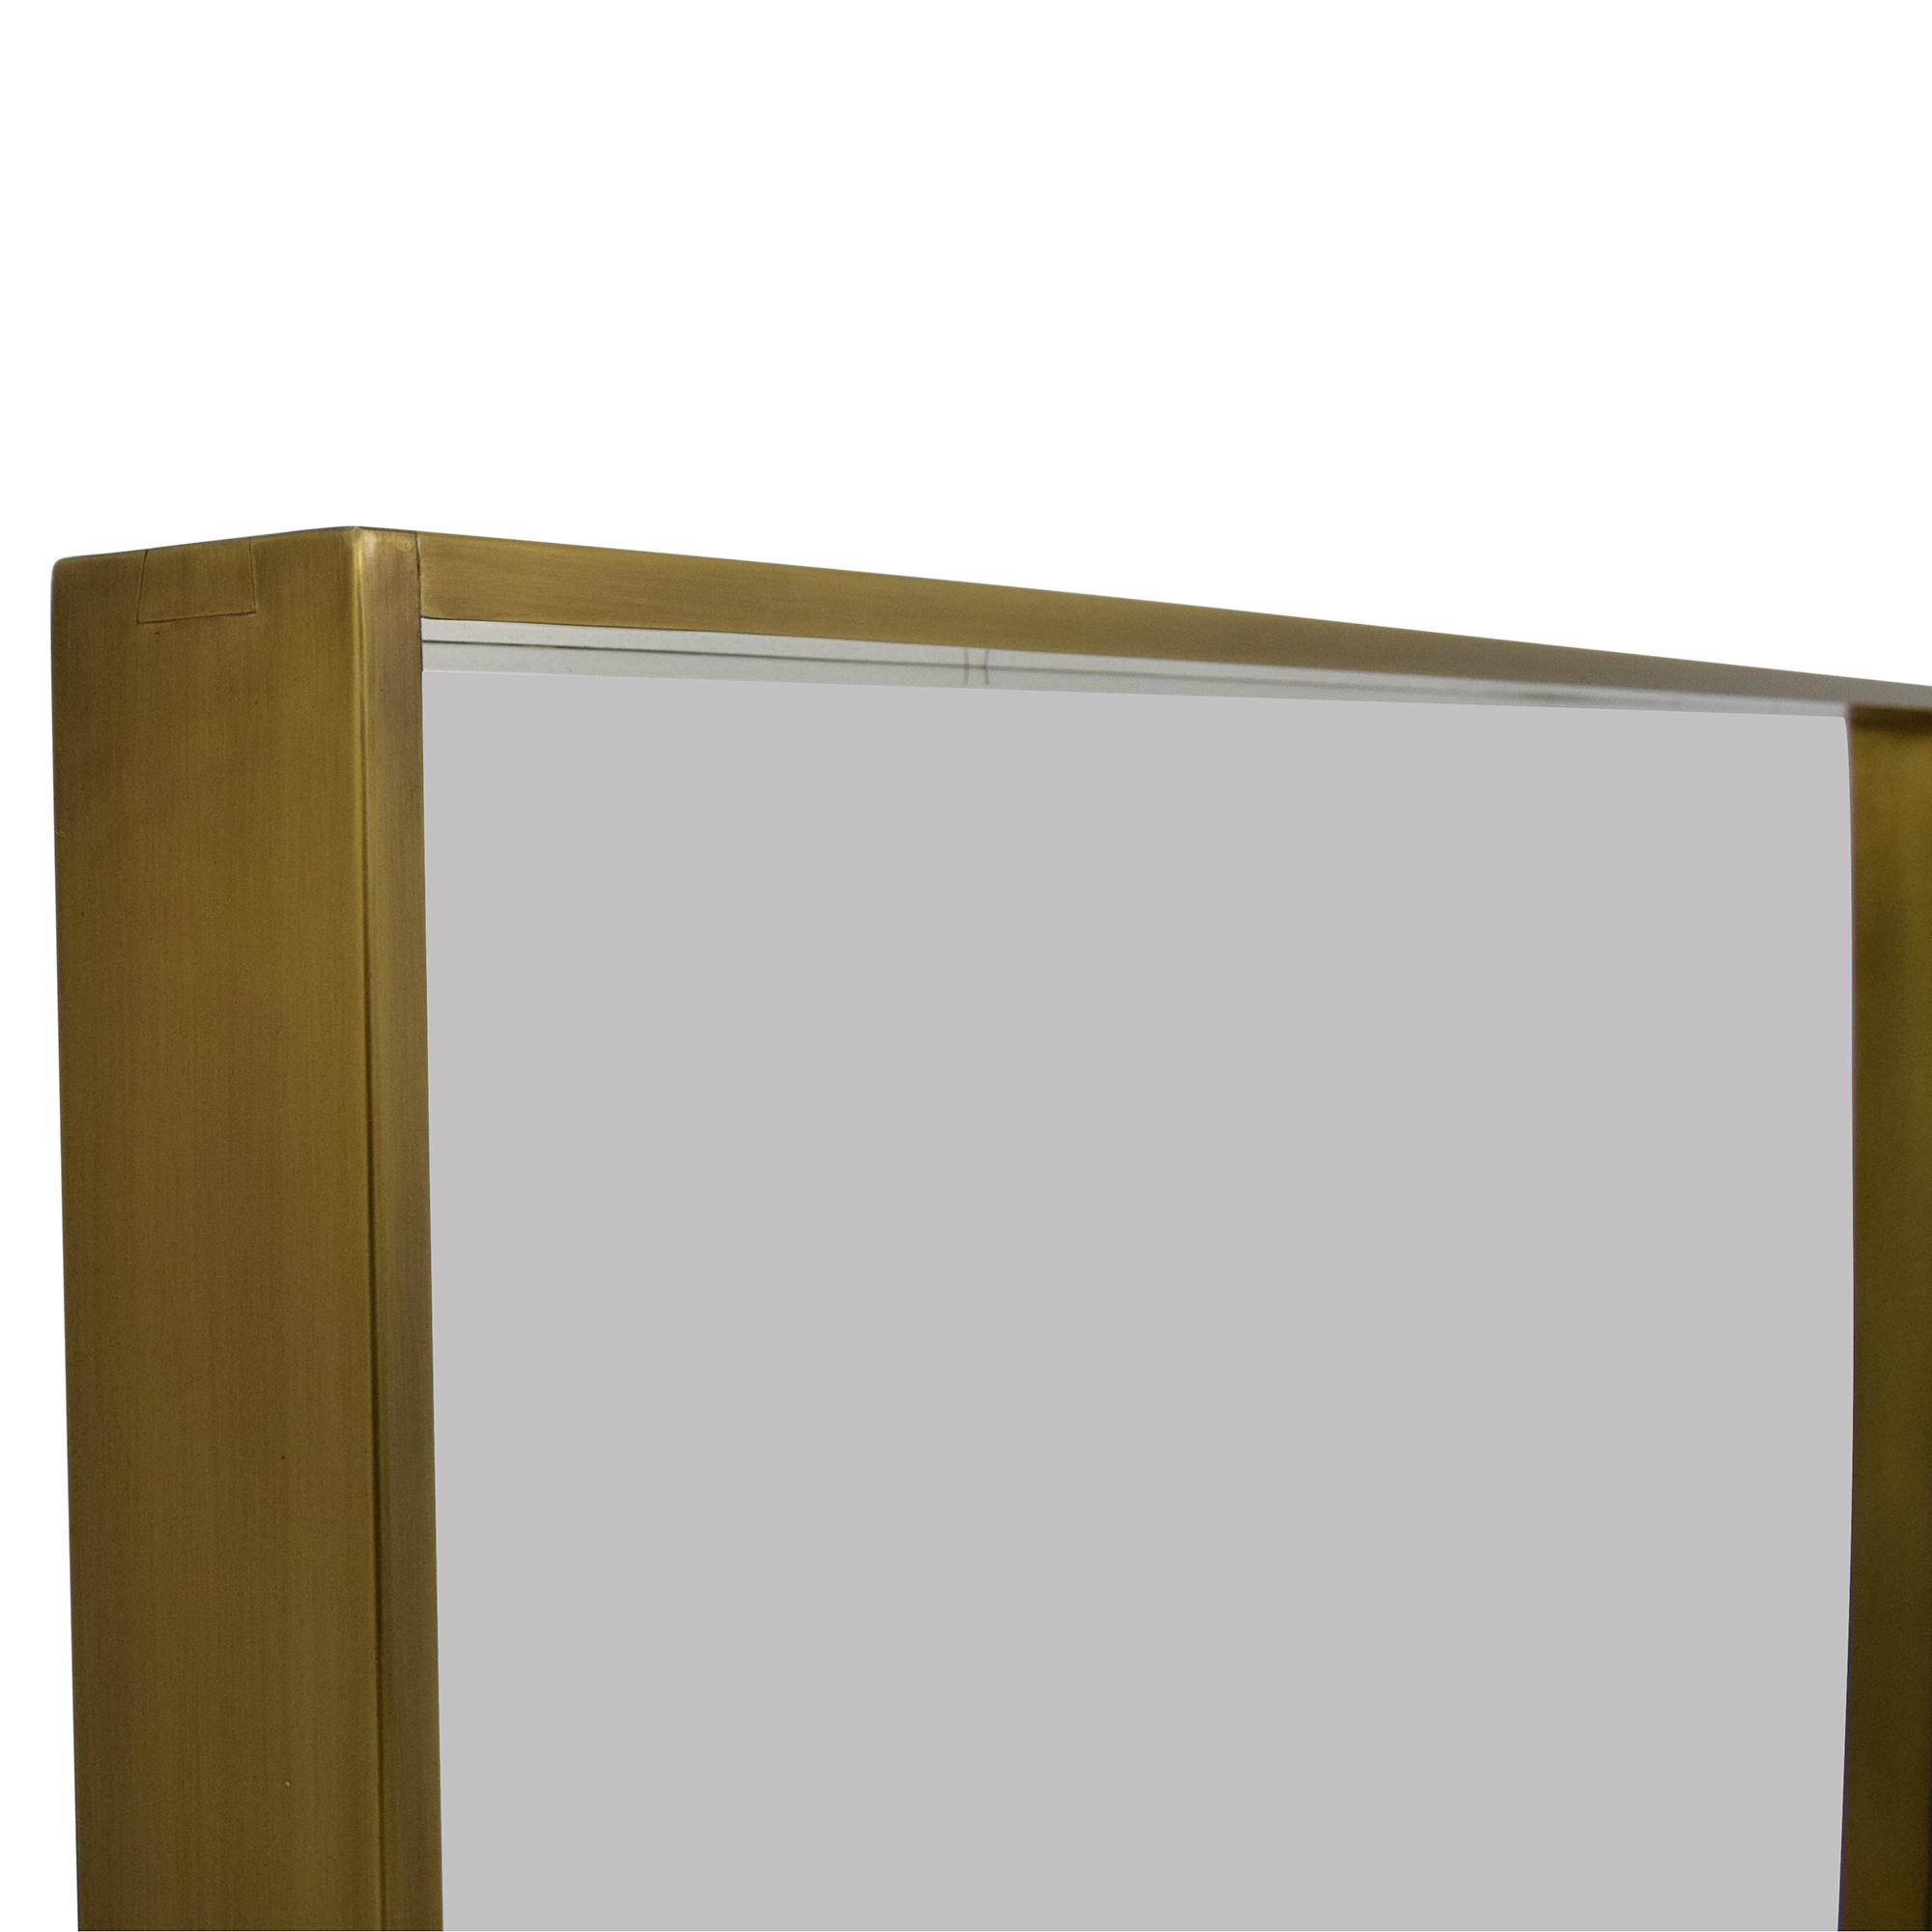 Restoration Hardware Metal Floating Mirror / Mirrors